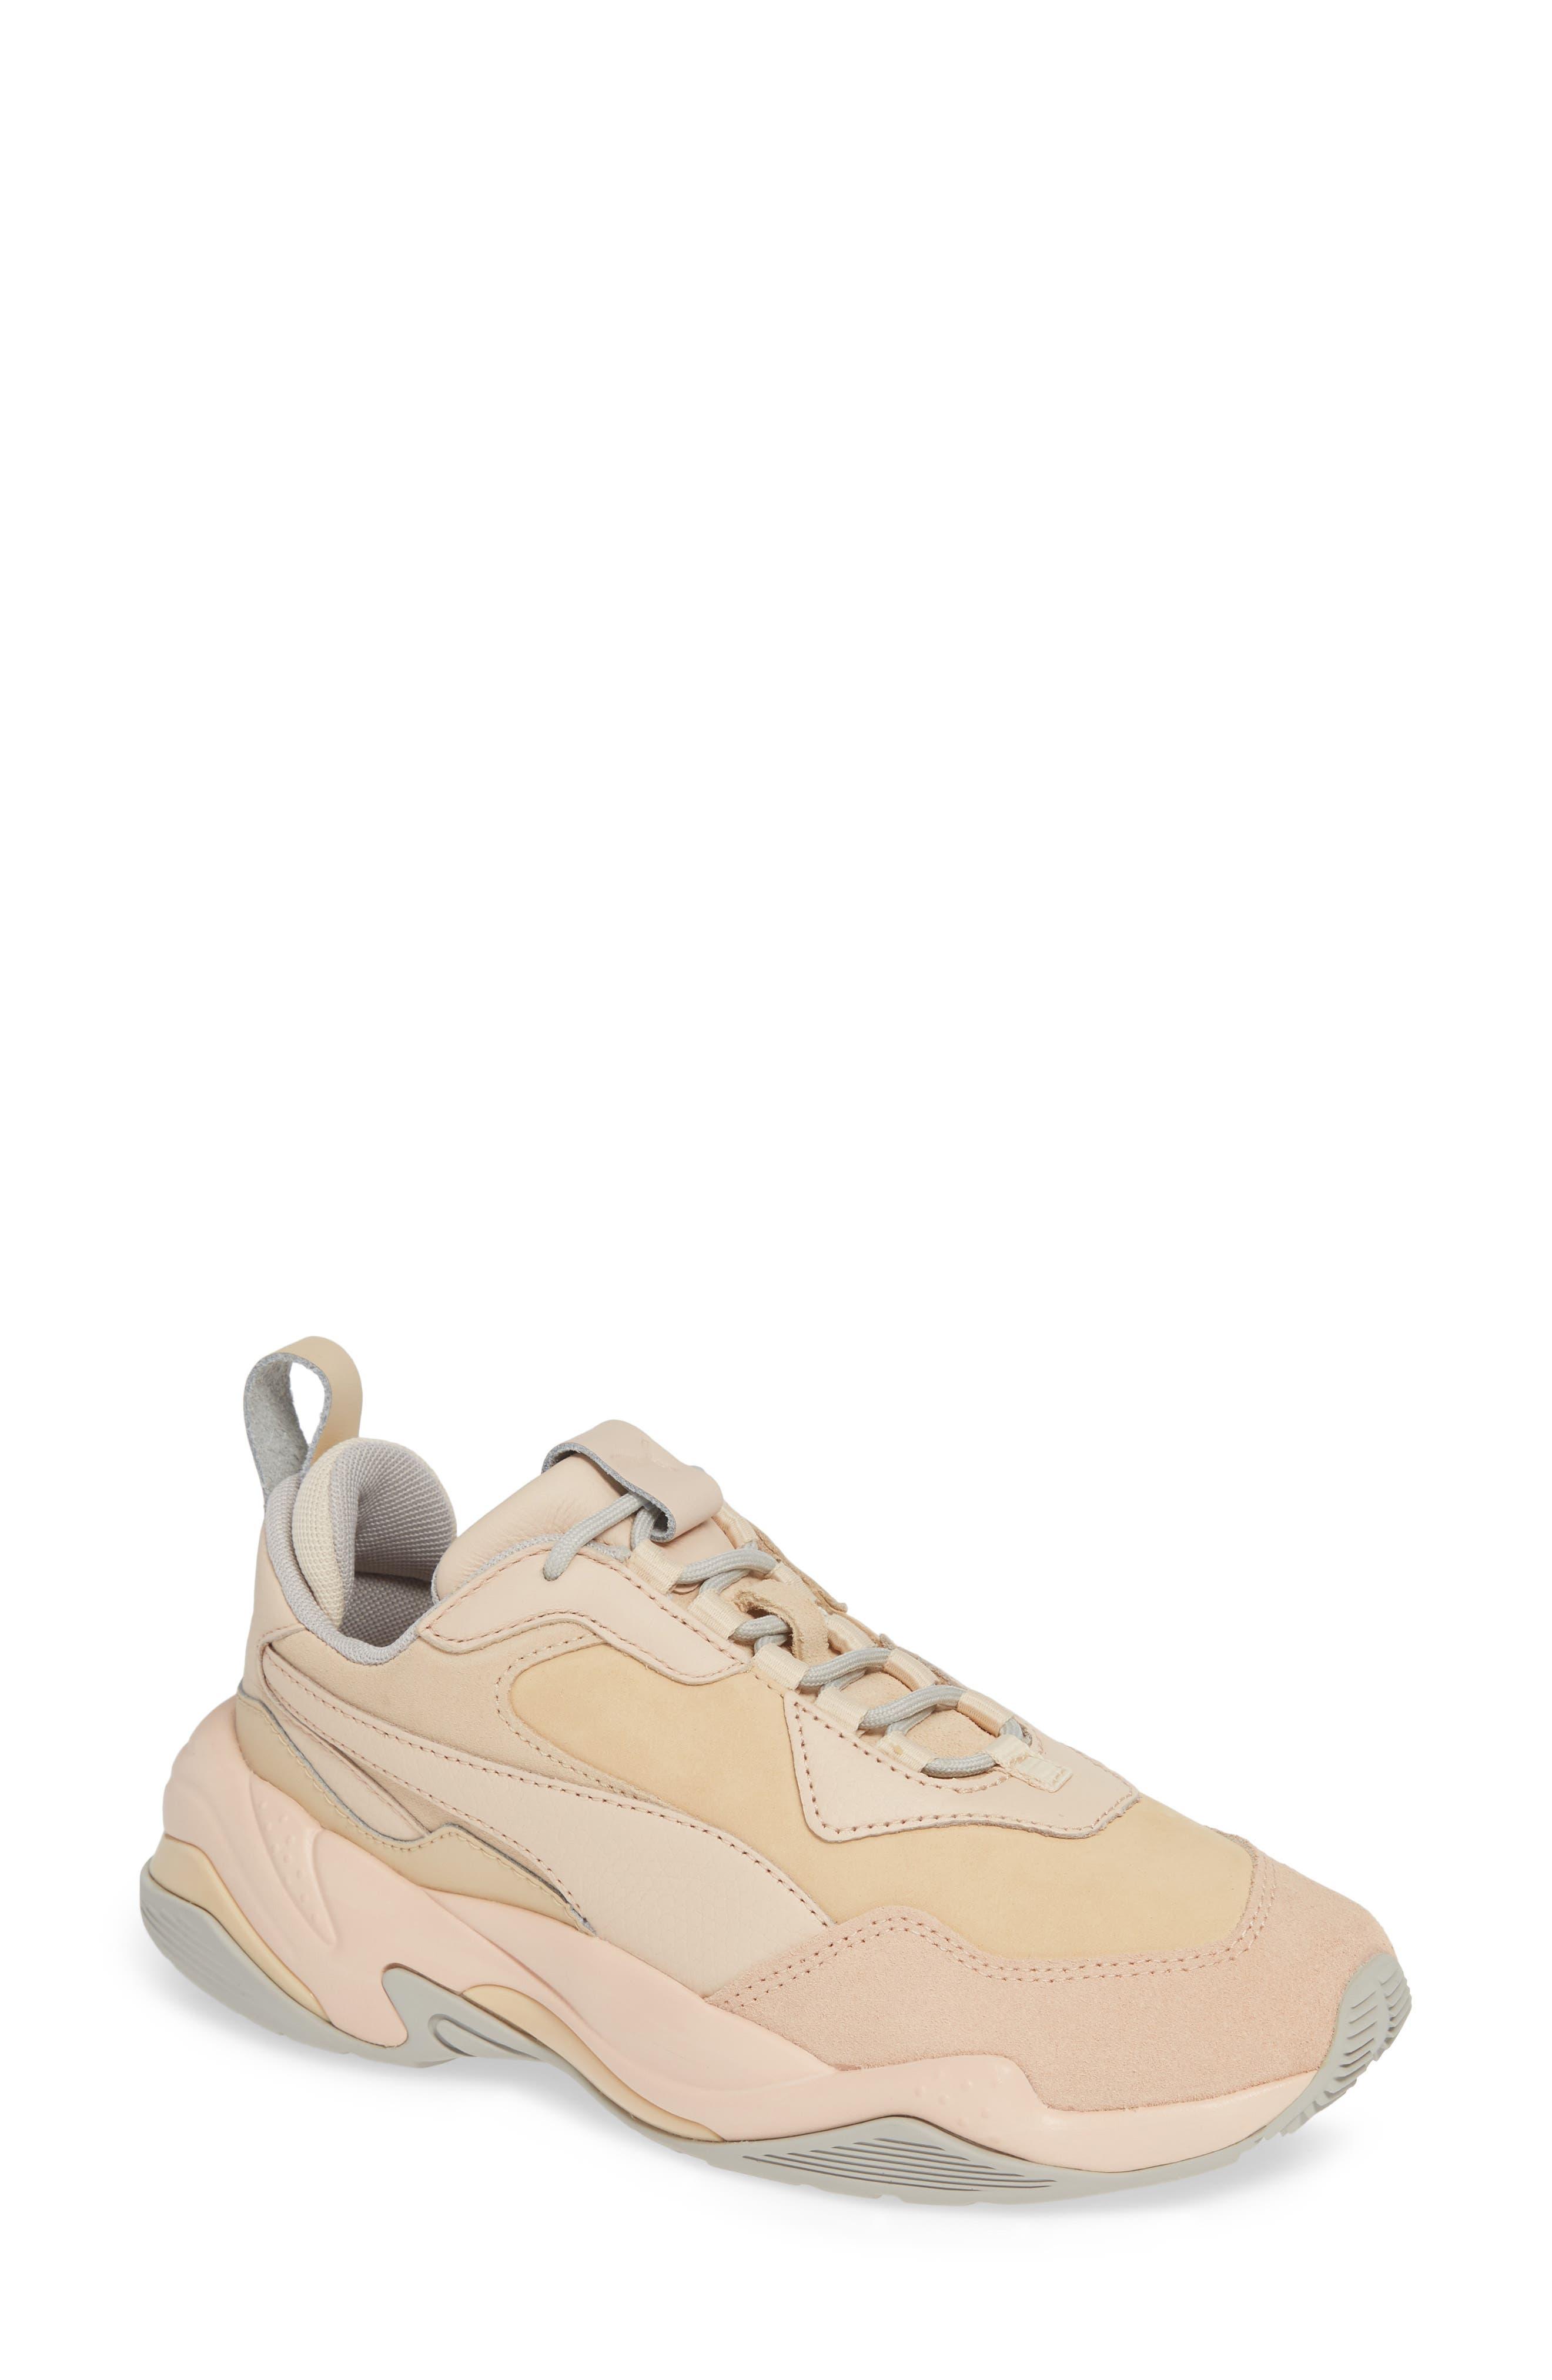 Thunder Desert Sneaker,                             Main thumbnail 1, color,                             NATURAL VACHETTA/ CREAM TAN